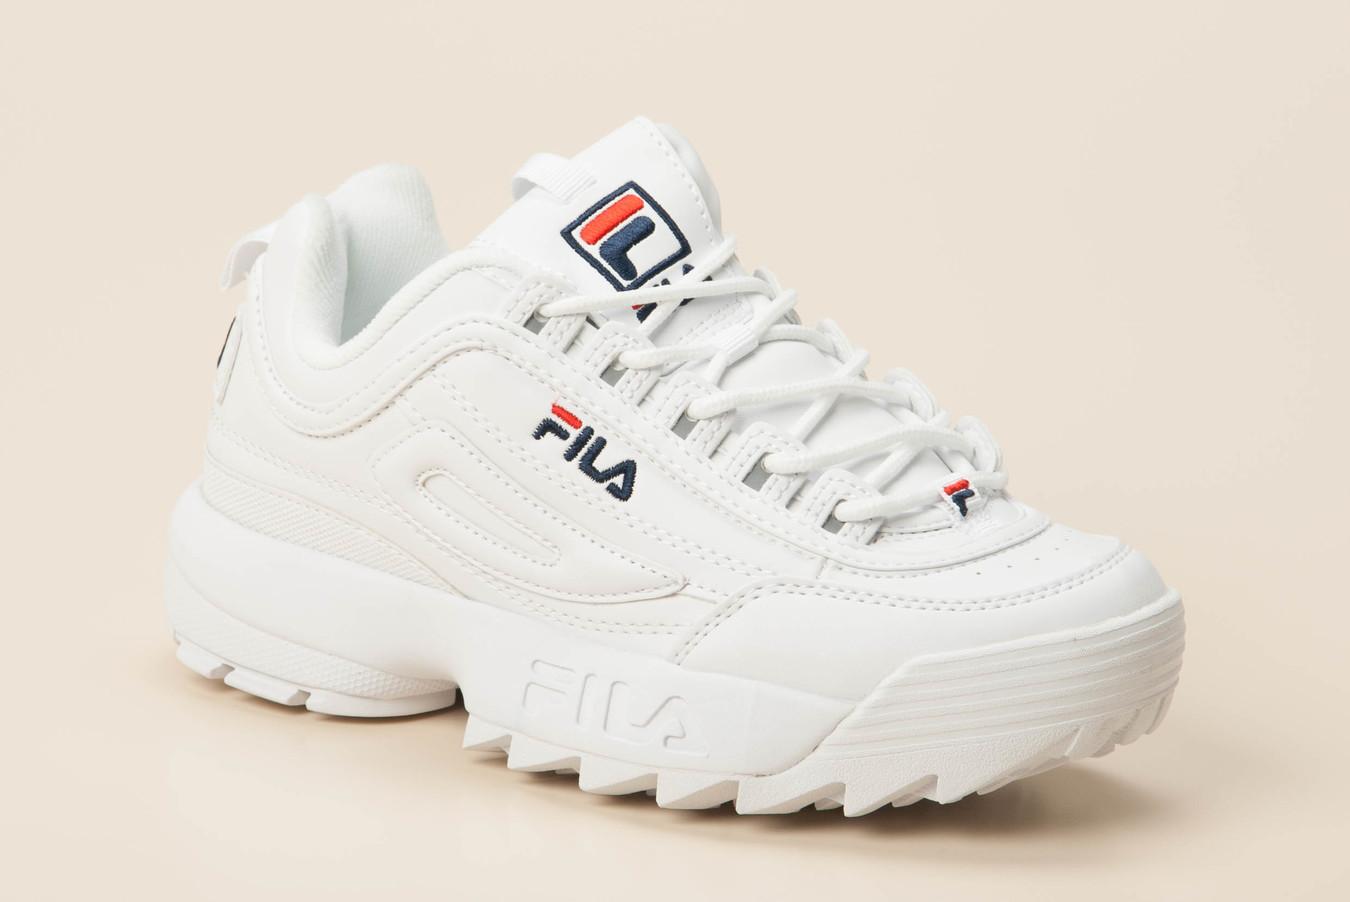 Fila Damen Sneaker in weiß kaufen | Zumnorde Online-Shop